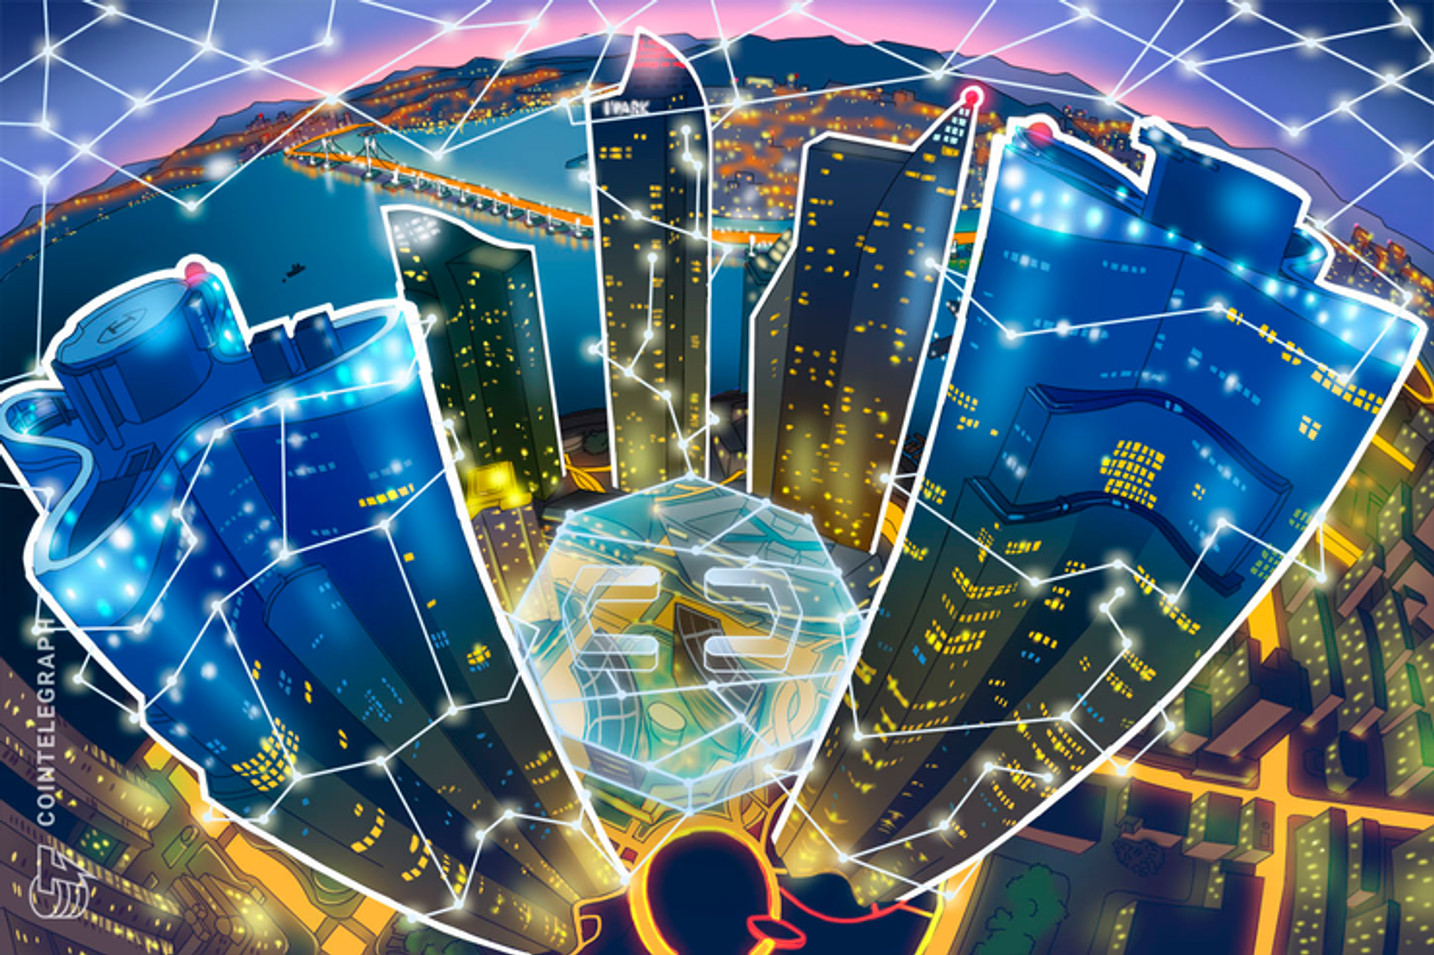 Tecnologia do Bitcoin, blockchain, ajuda Junta Comercial do Ceará a registrar documentos